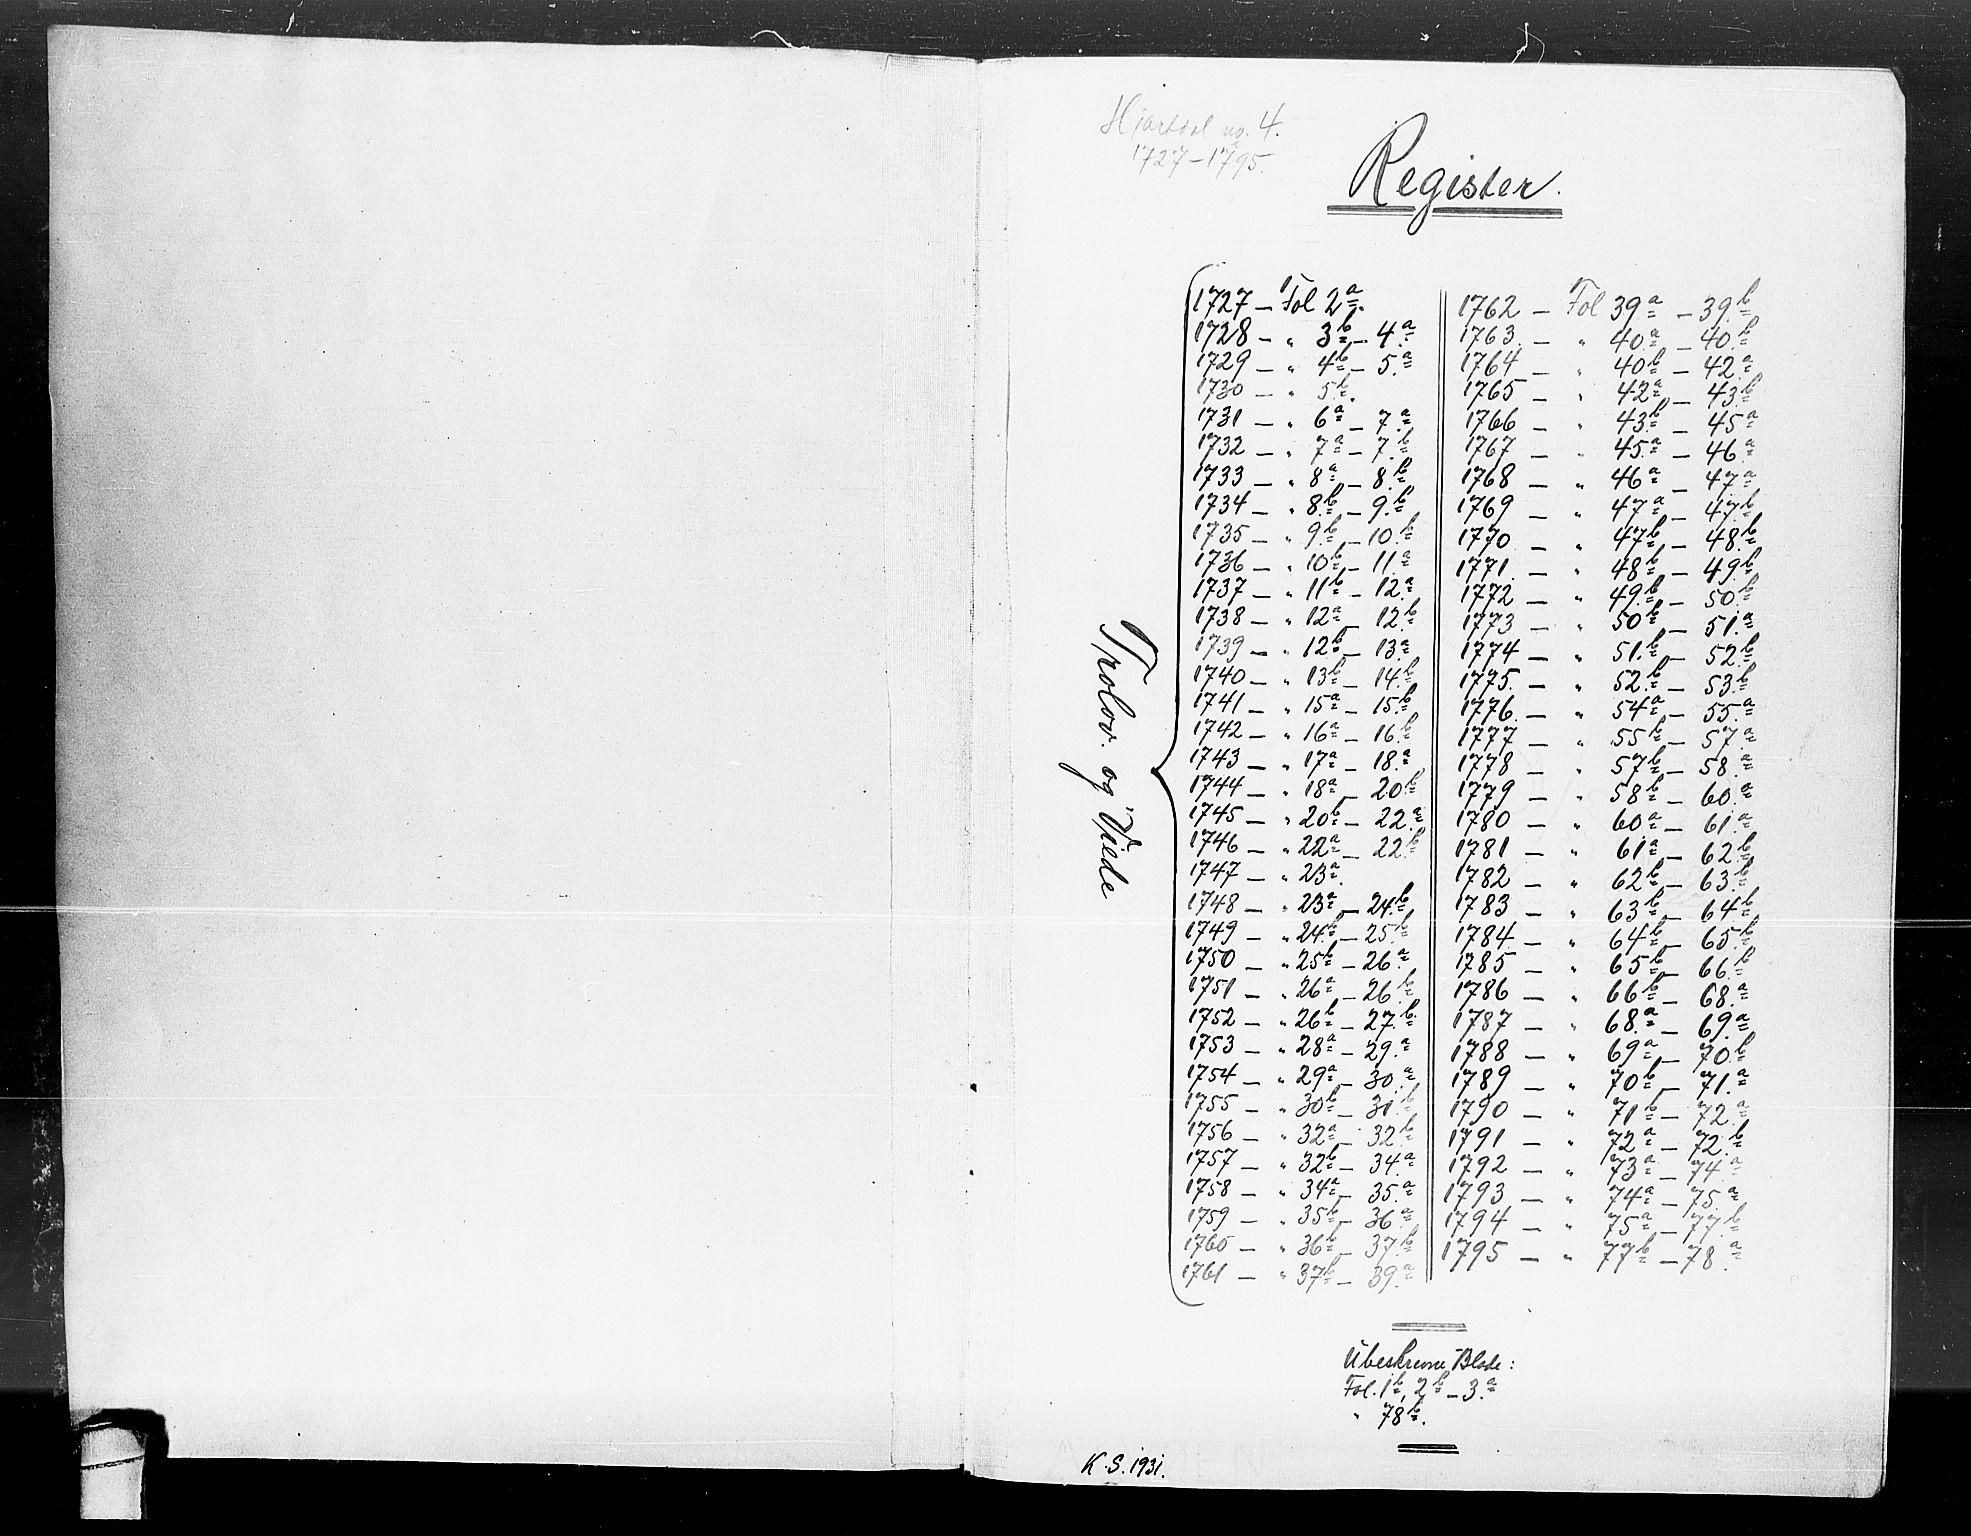 SAKO, Hjartdal kirkebøker, F/Fa/L0004: Ministerialbok nr. I 4, 1727-1795